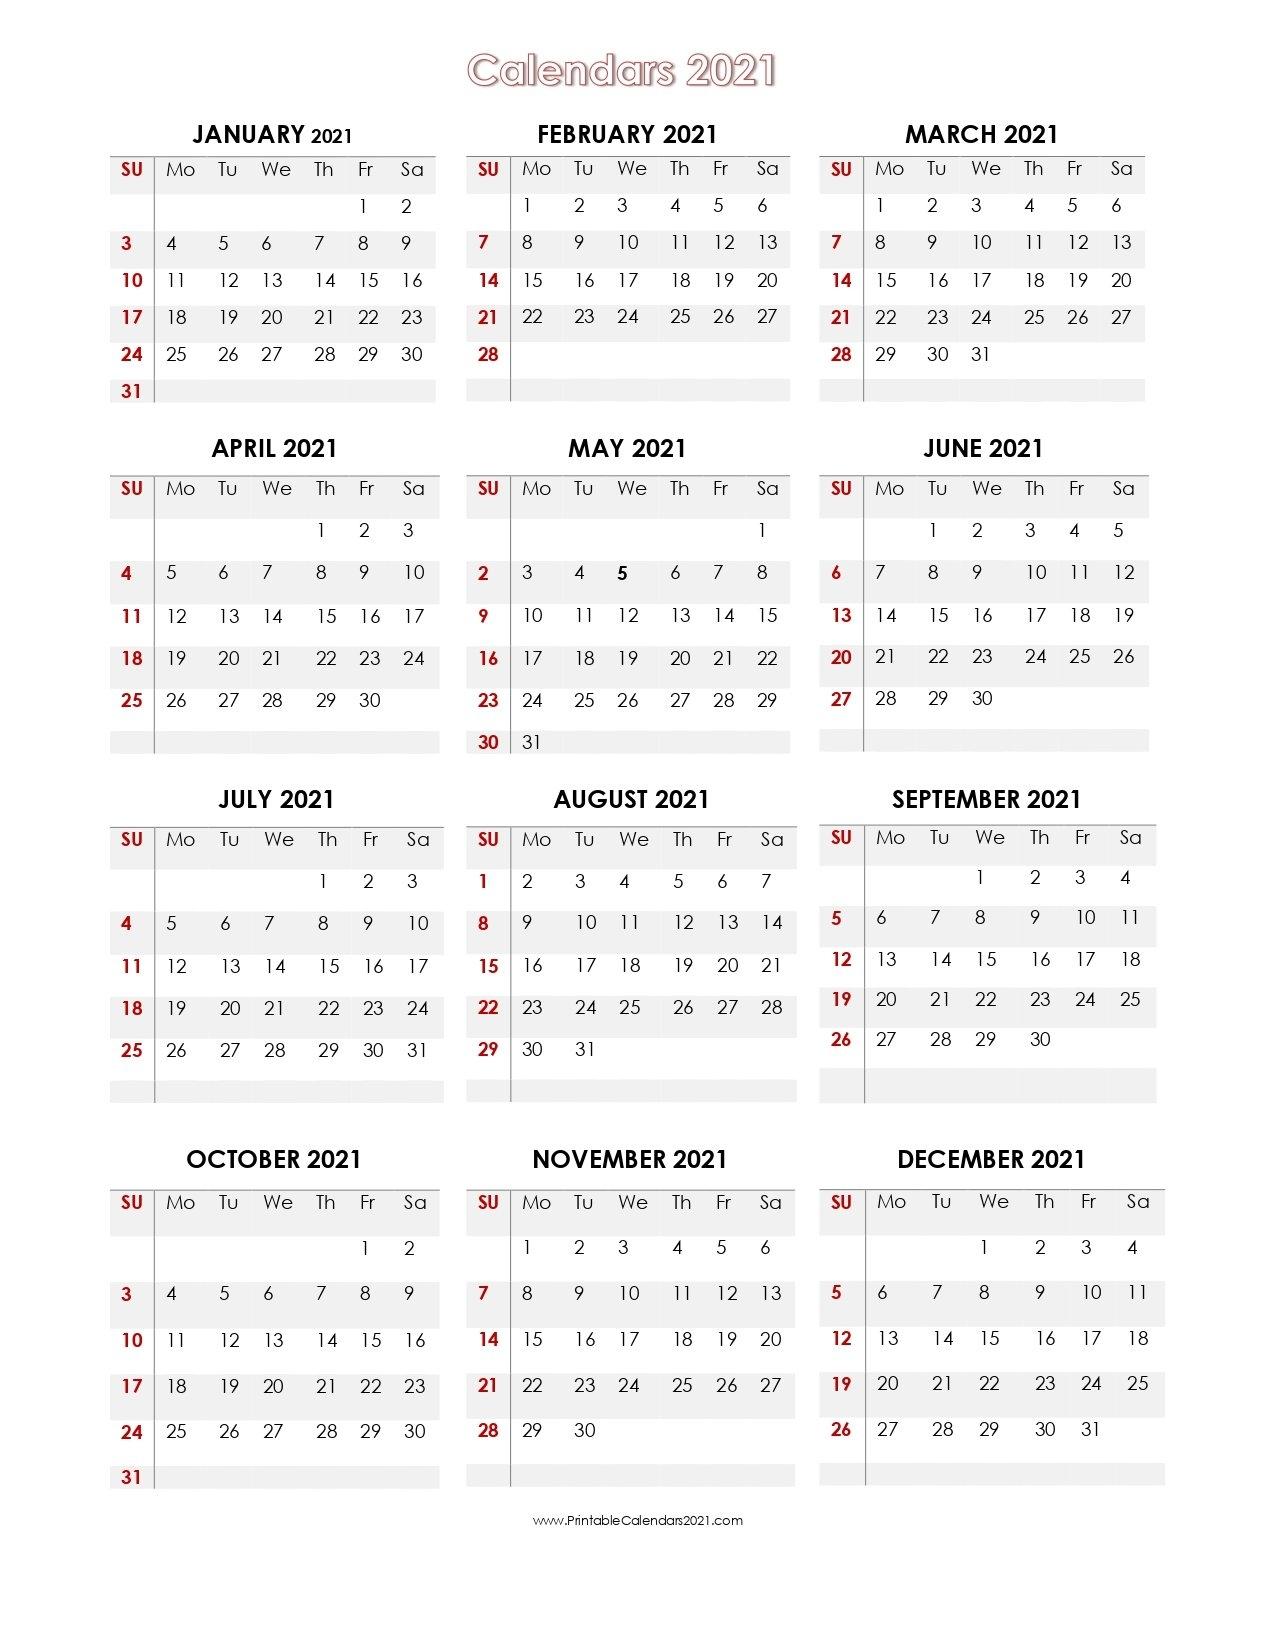 56+ Printable Calendar 2021 One Page, Printable 2021 Yearly Calendar throughout 2021 Calendar Printable One Page Photo